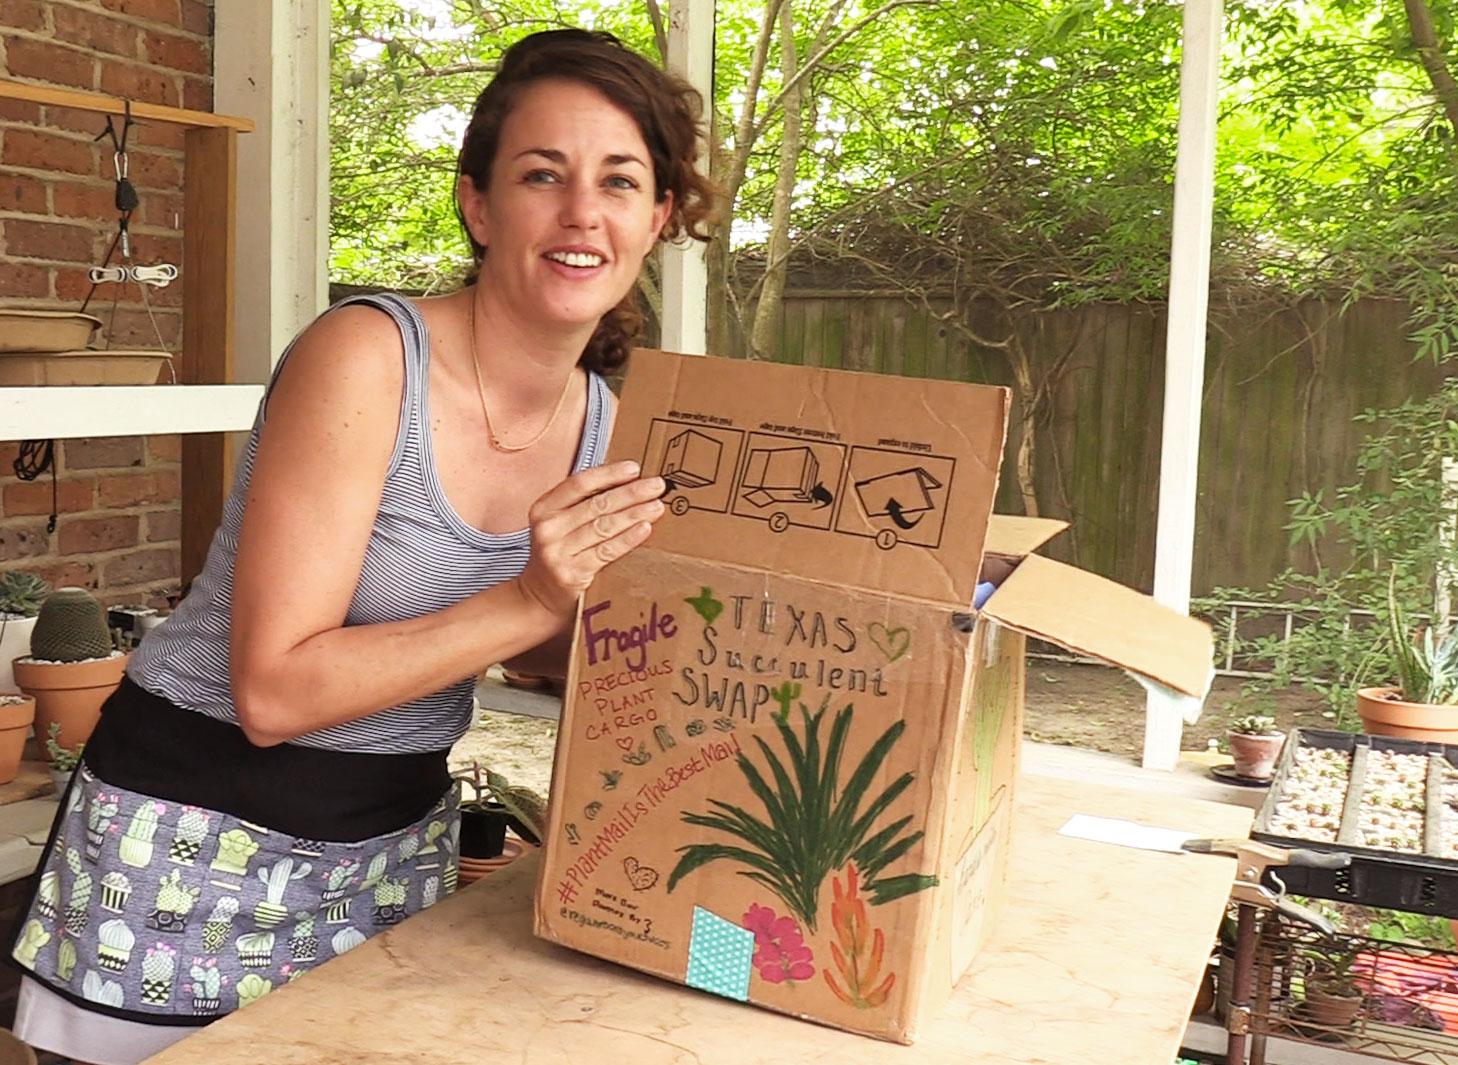 Succulent swap unboxing - Sucs for You